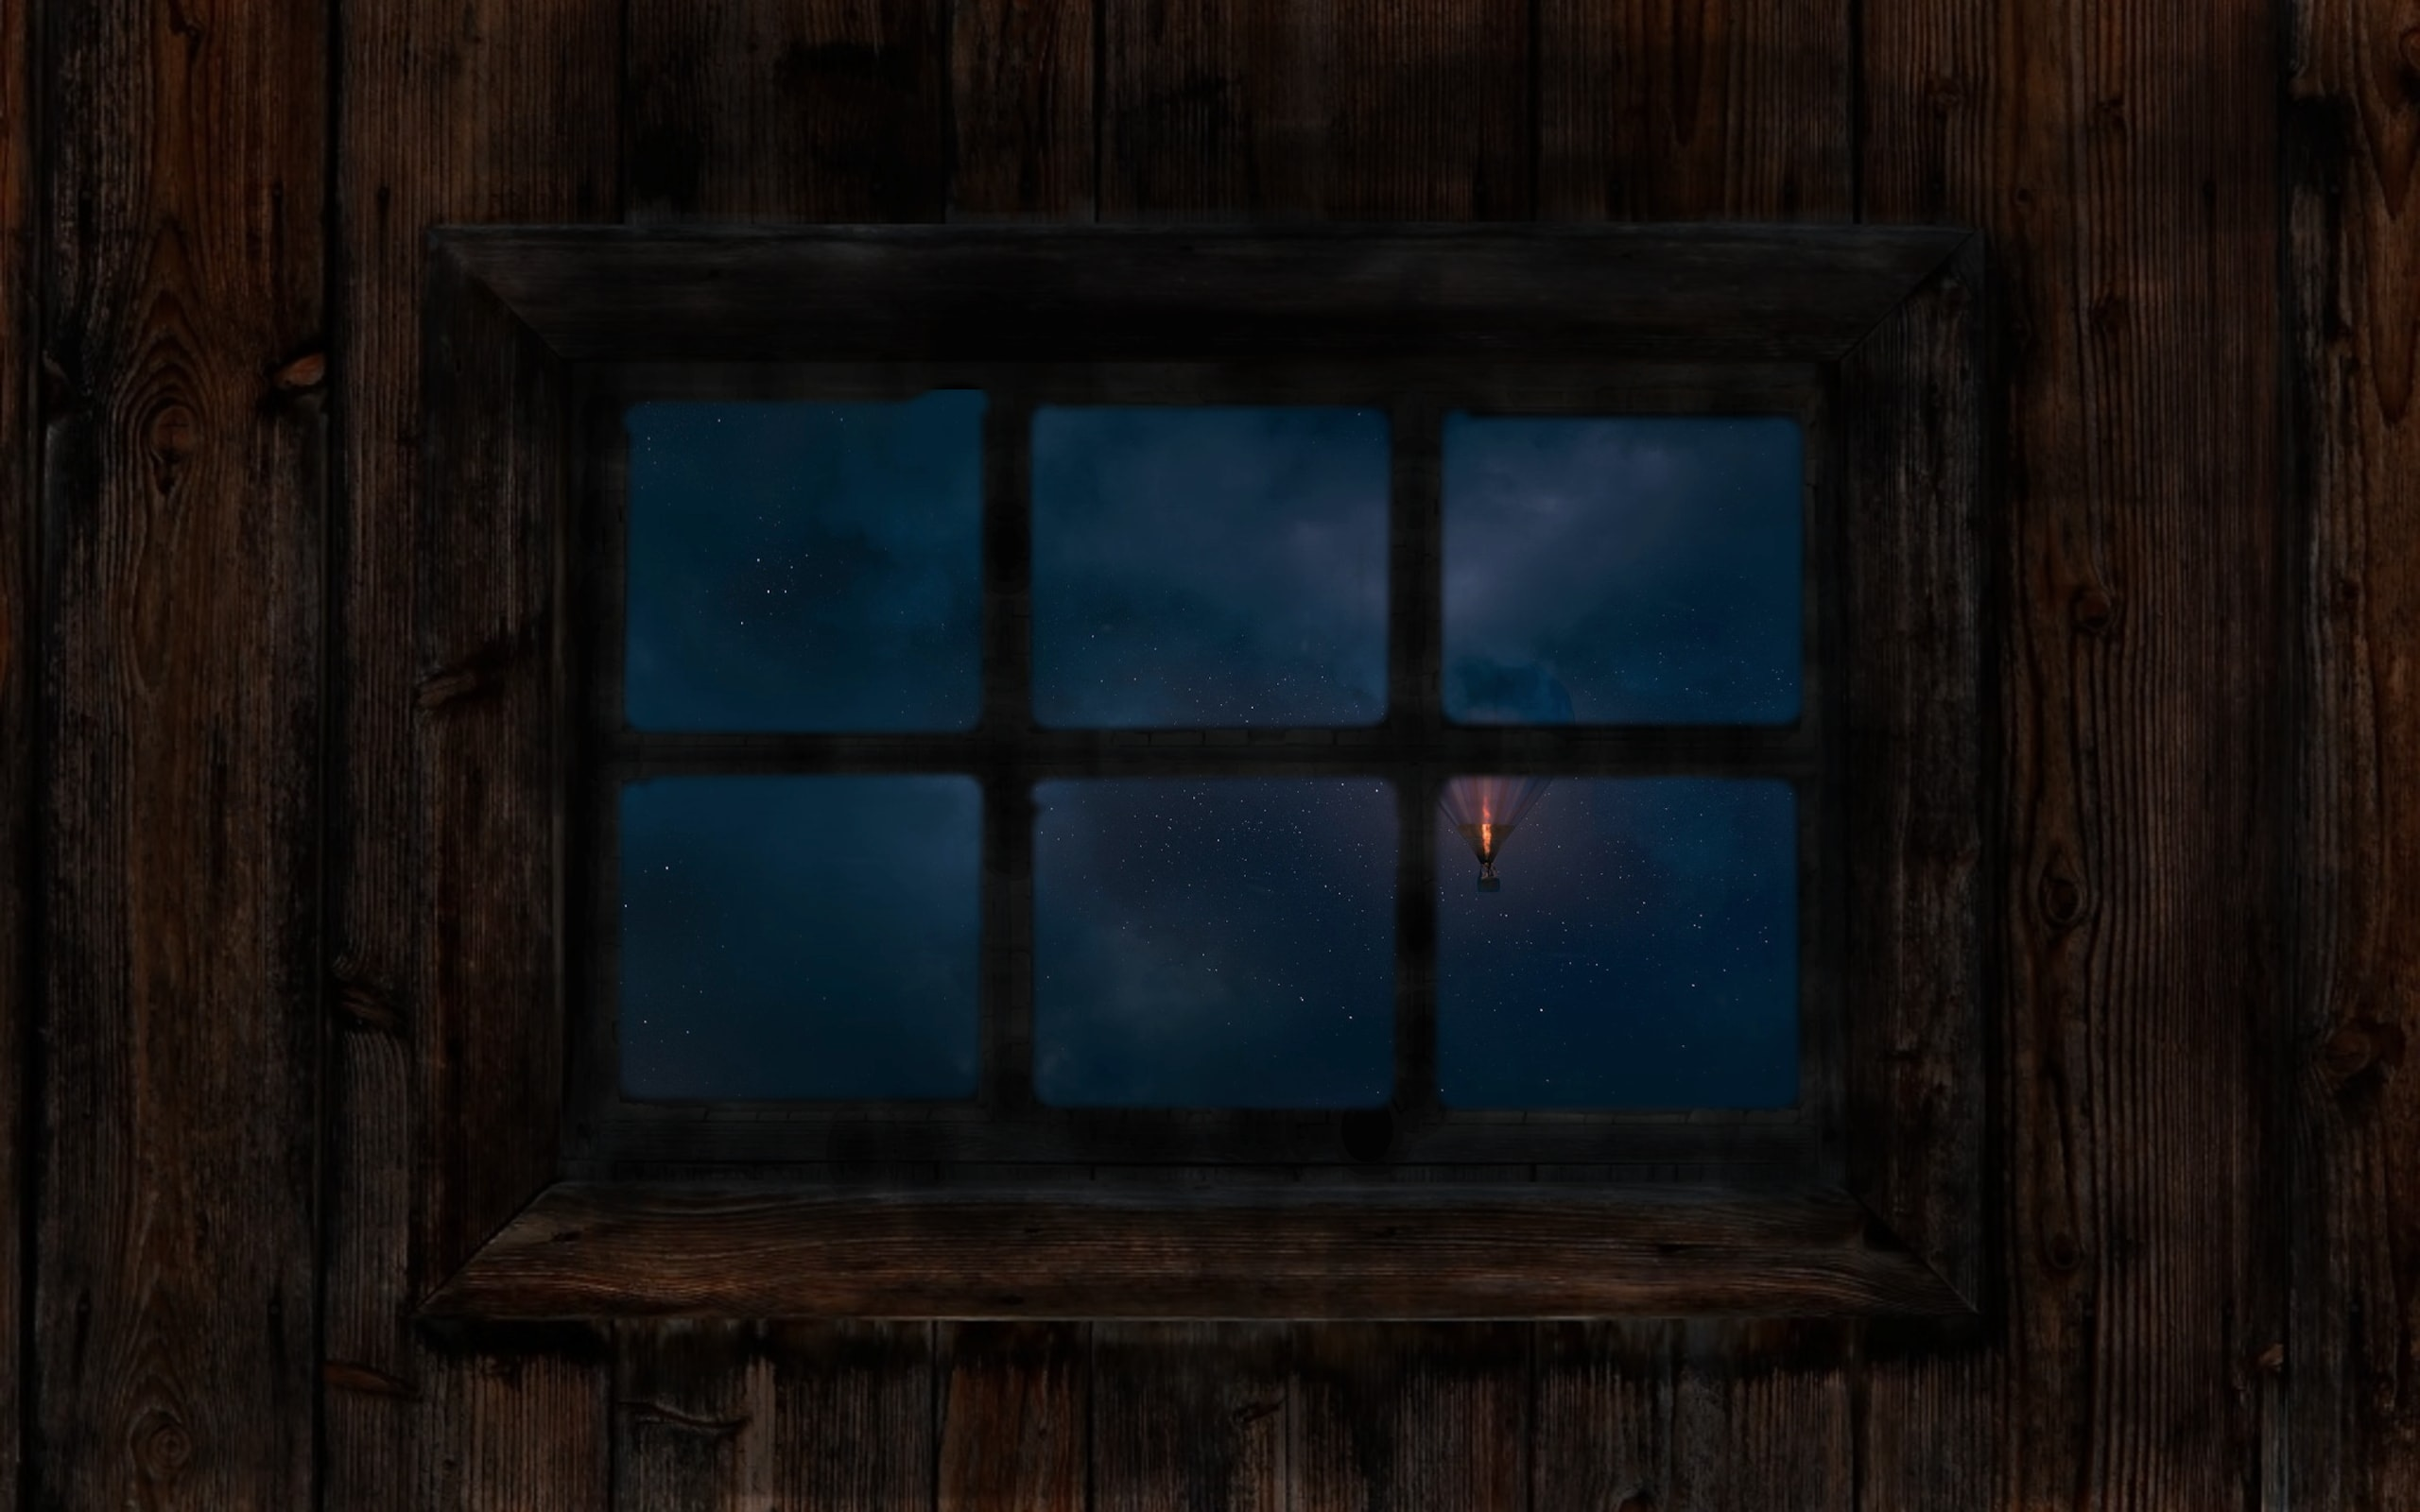 Night Sky Window